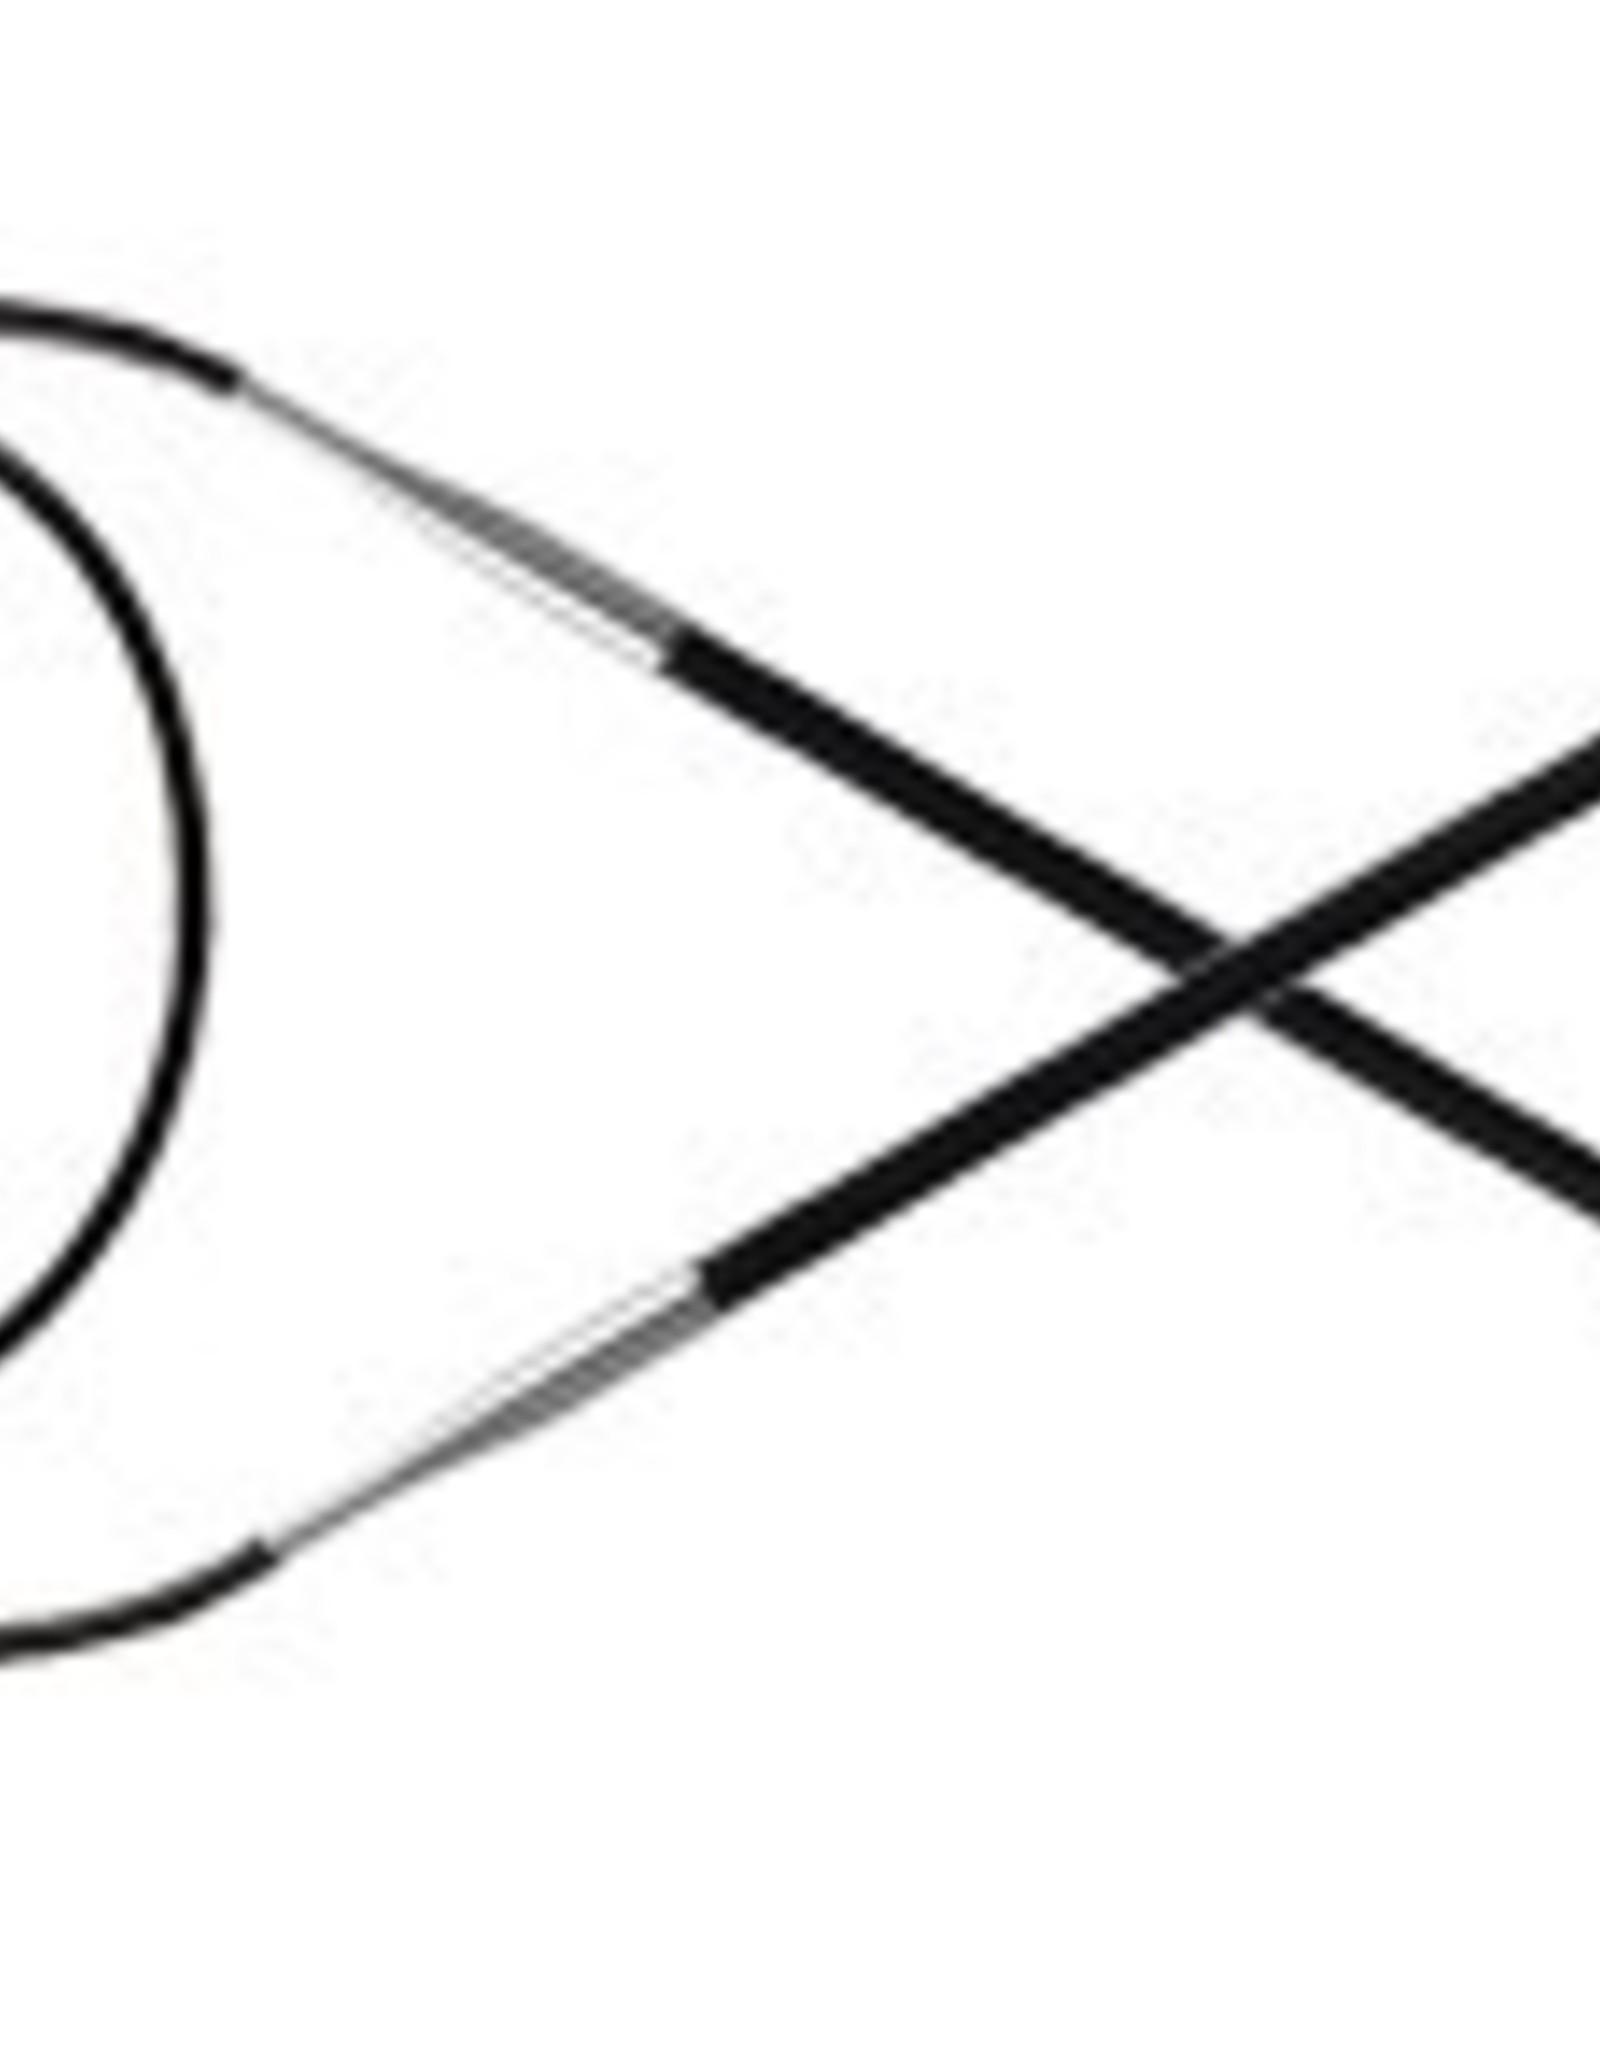 Knitter's Pride 9 Karbonz Circular 32